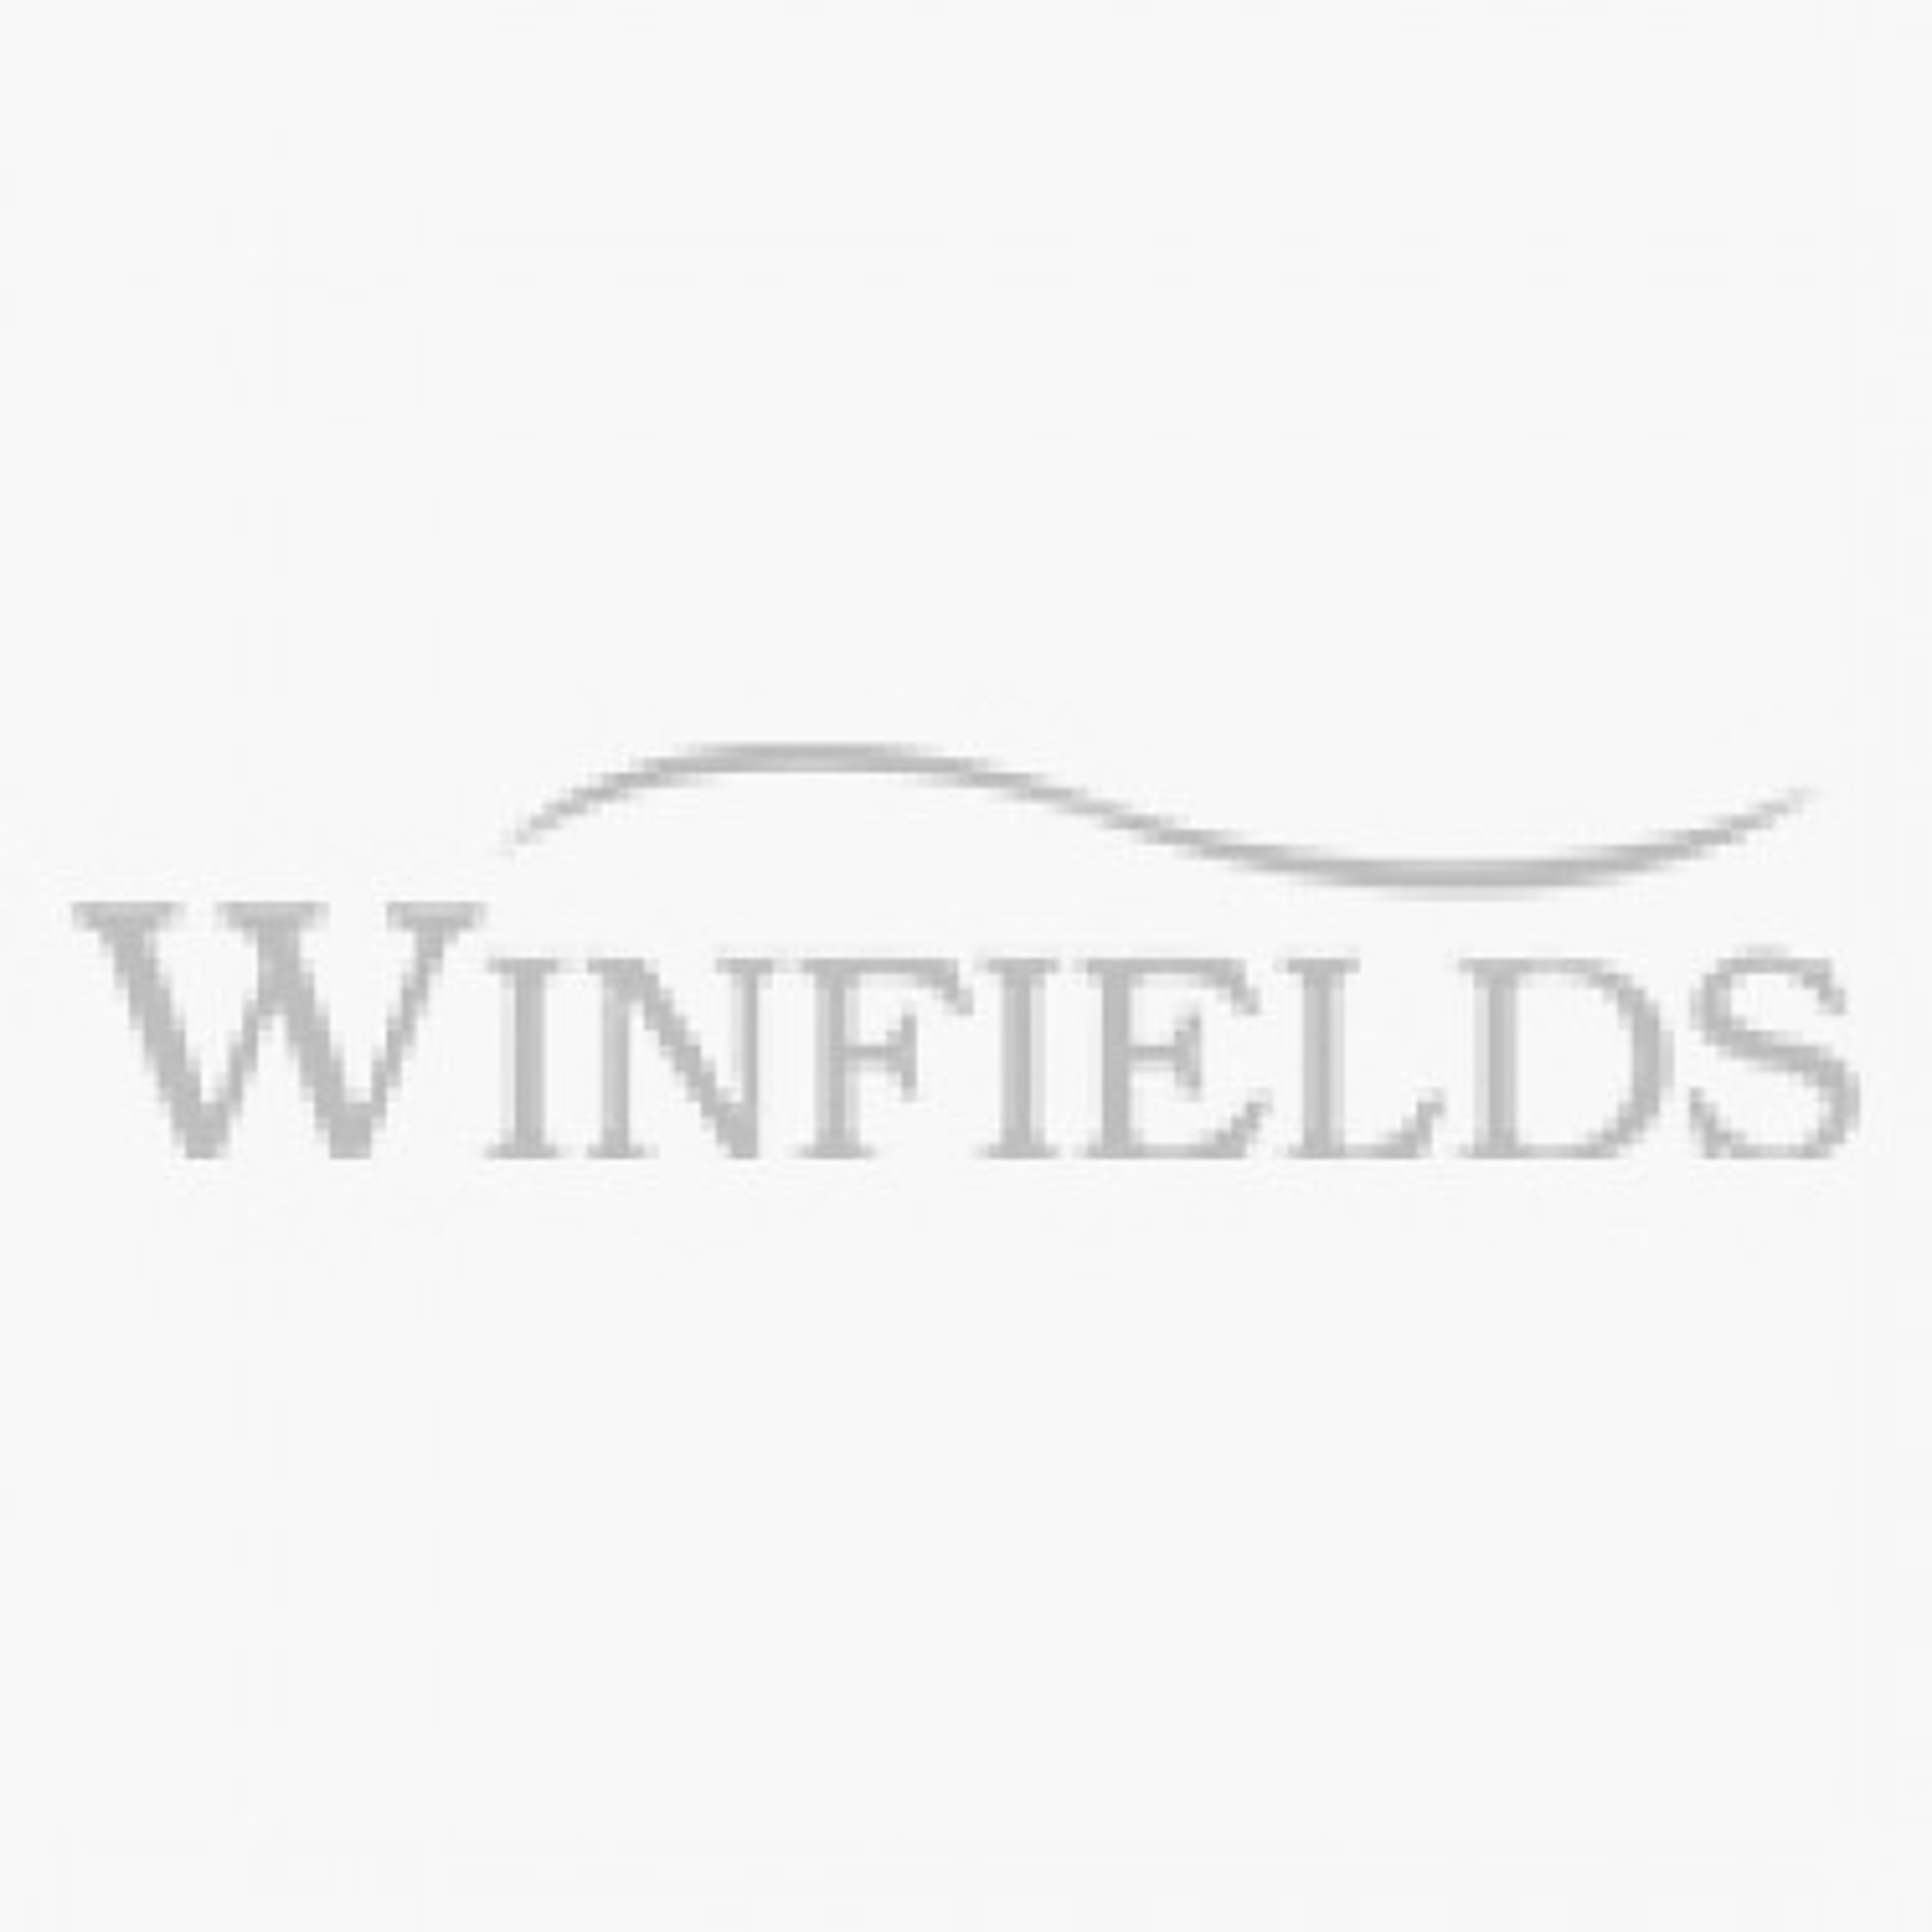 Craghoppers Mens Classic Kiwi Trousers - Bark - 30s